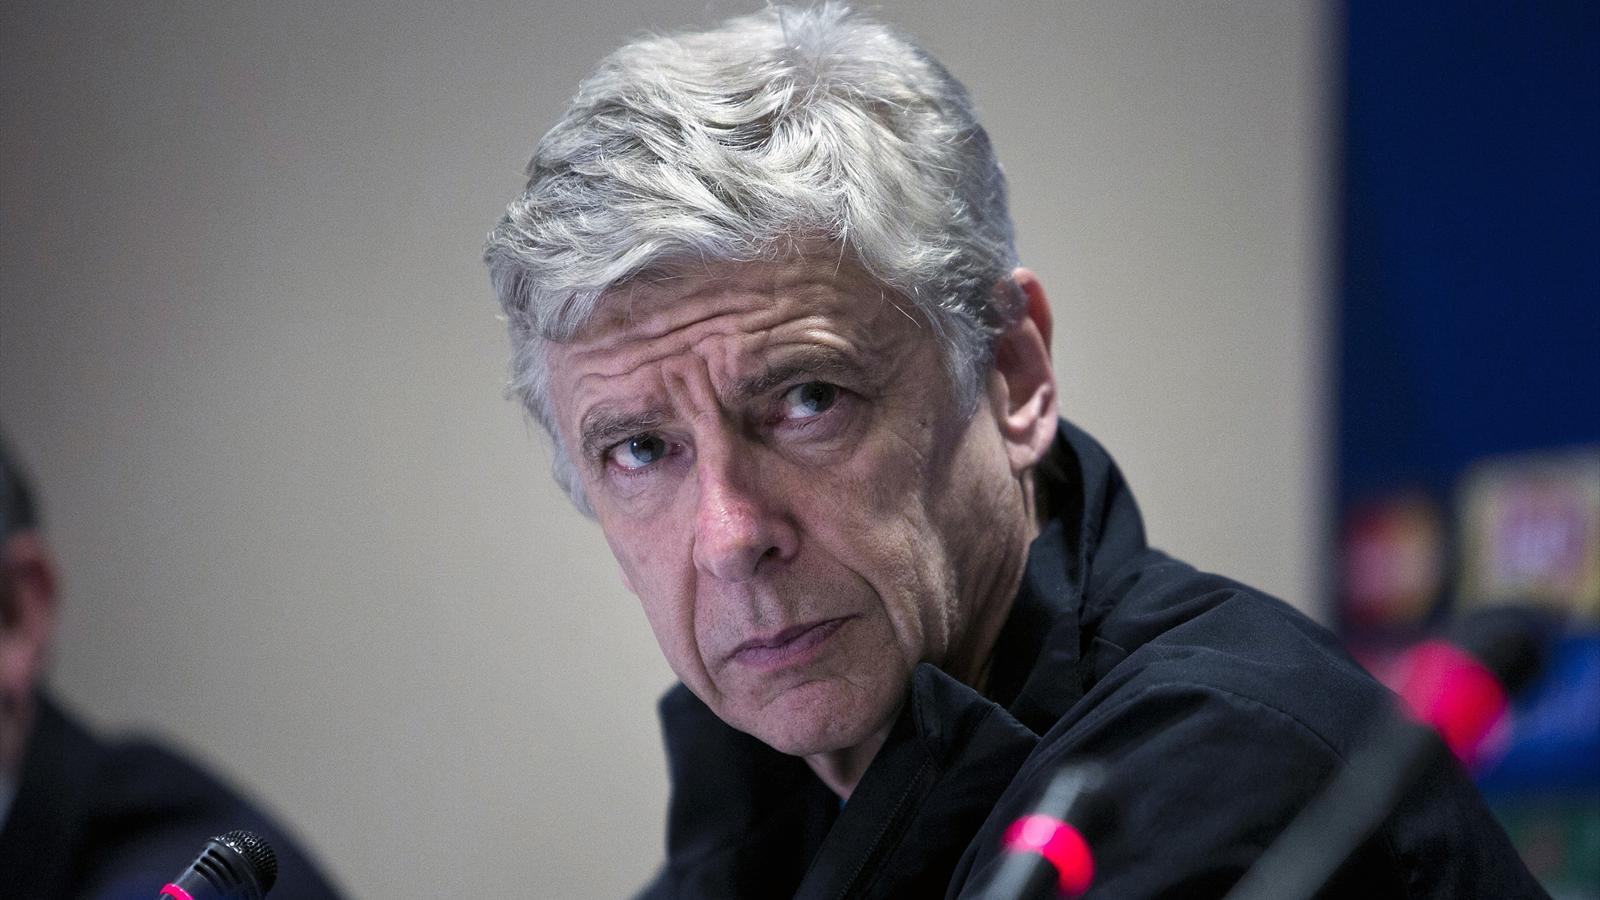 Louis van Gaal speculation disrespectful, says Arsene Wenger